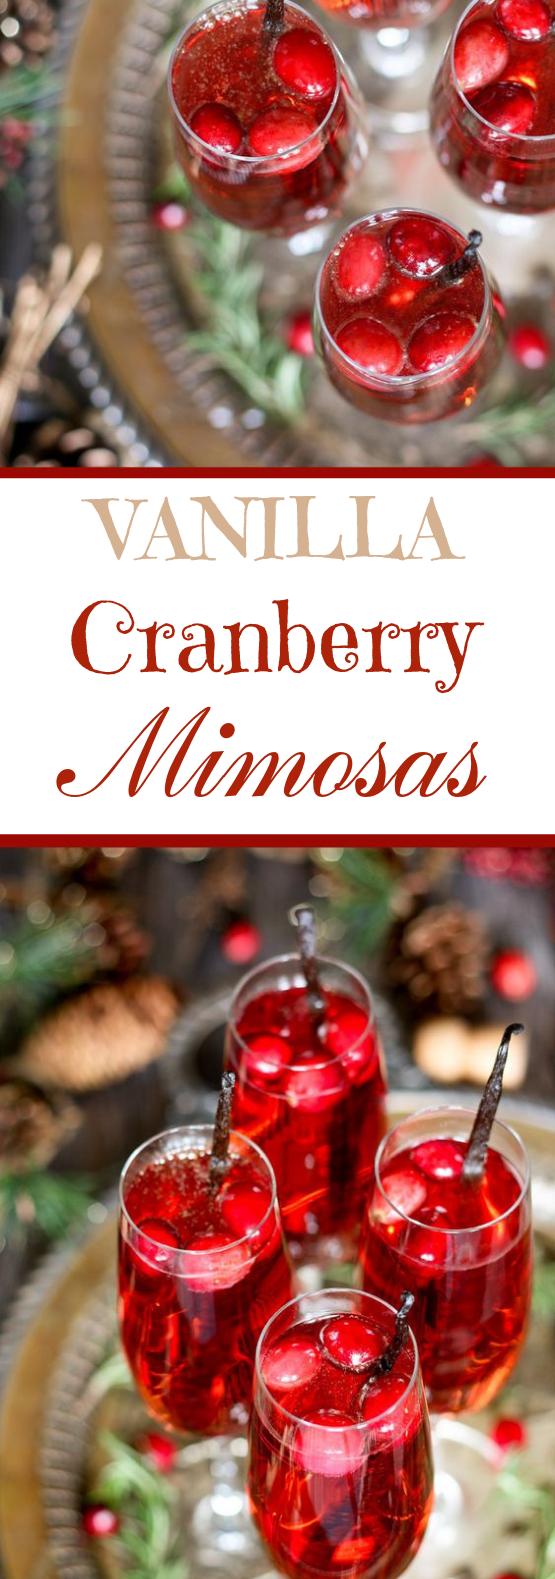 Vanilla Cranberry Mimosa #alcohol #drinks